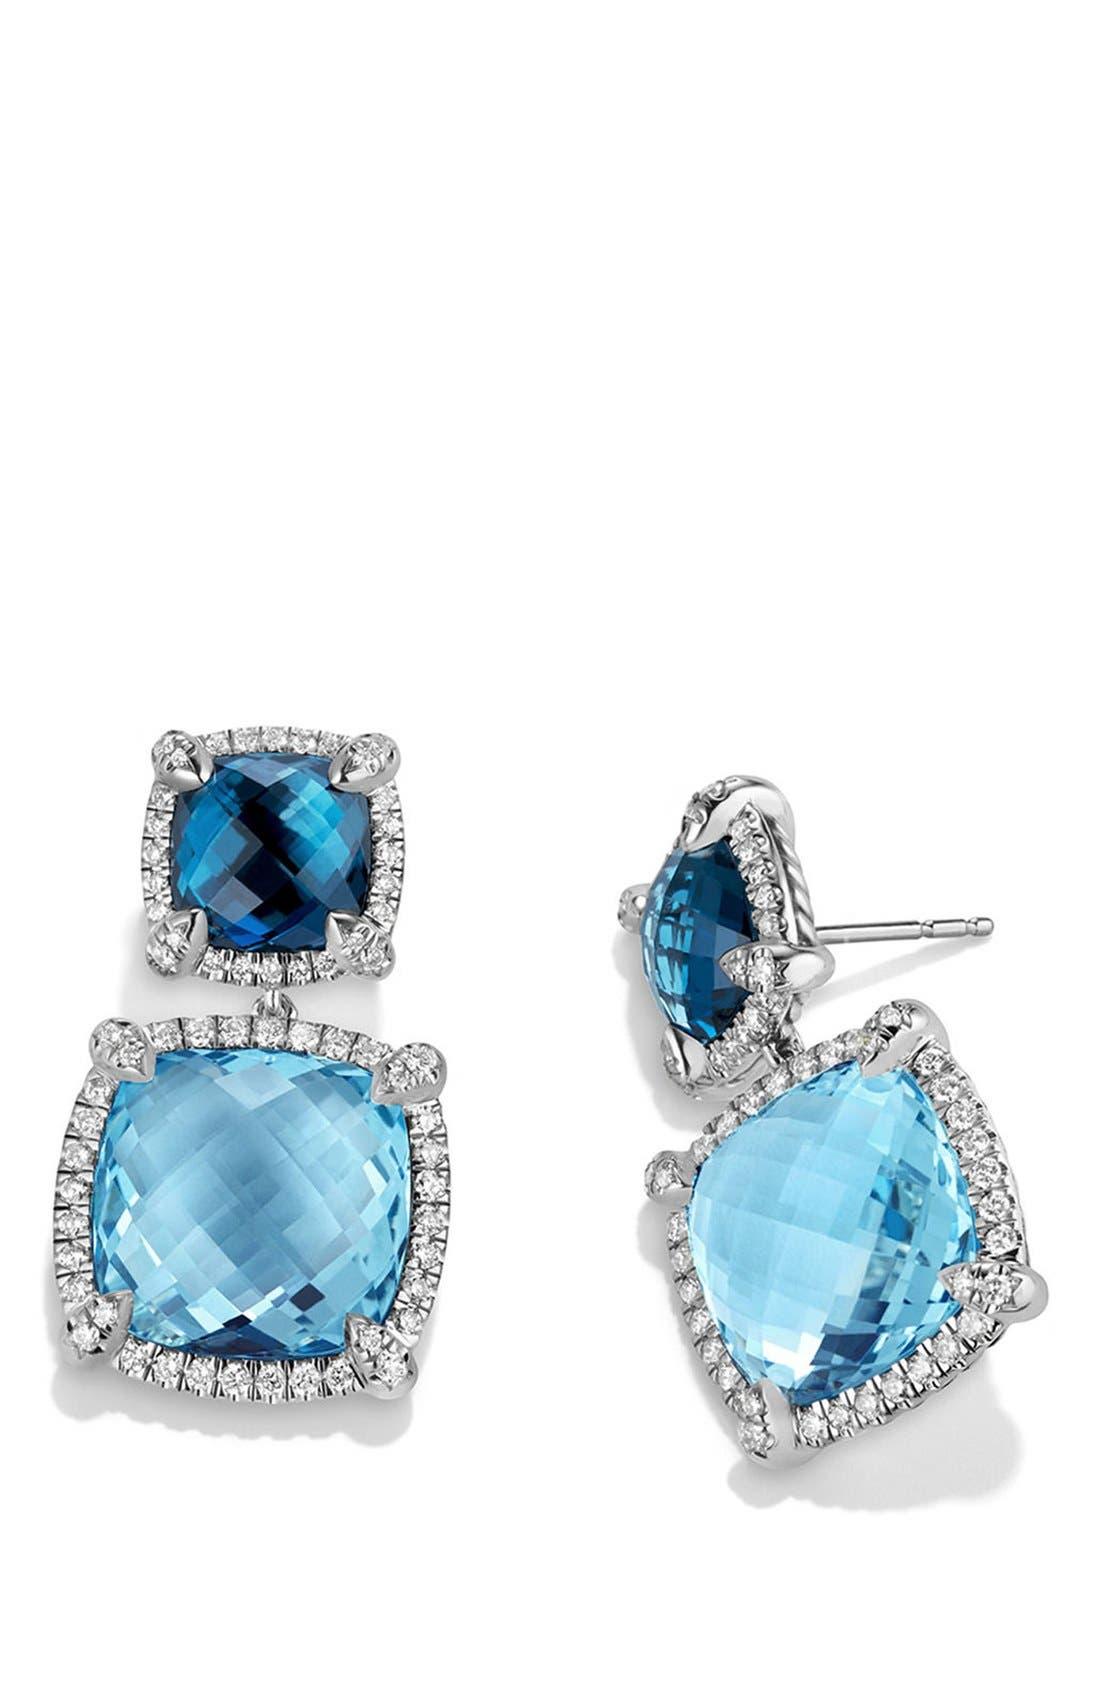 Alternate Image 2  - David Yurman 'Châtelaine' Pavé Bezel Double Drop Earrings with Diamonds